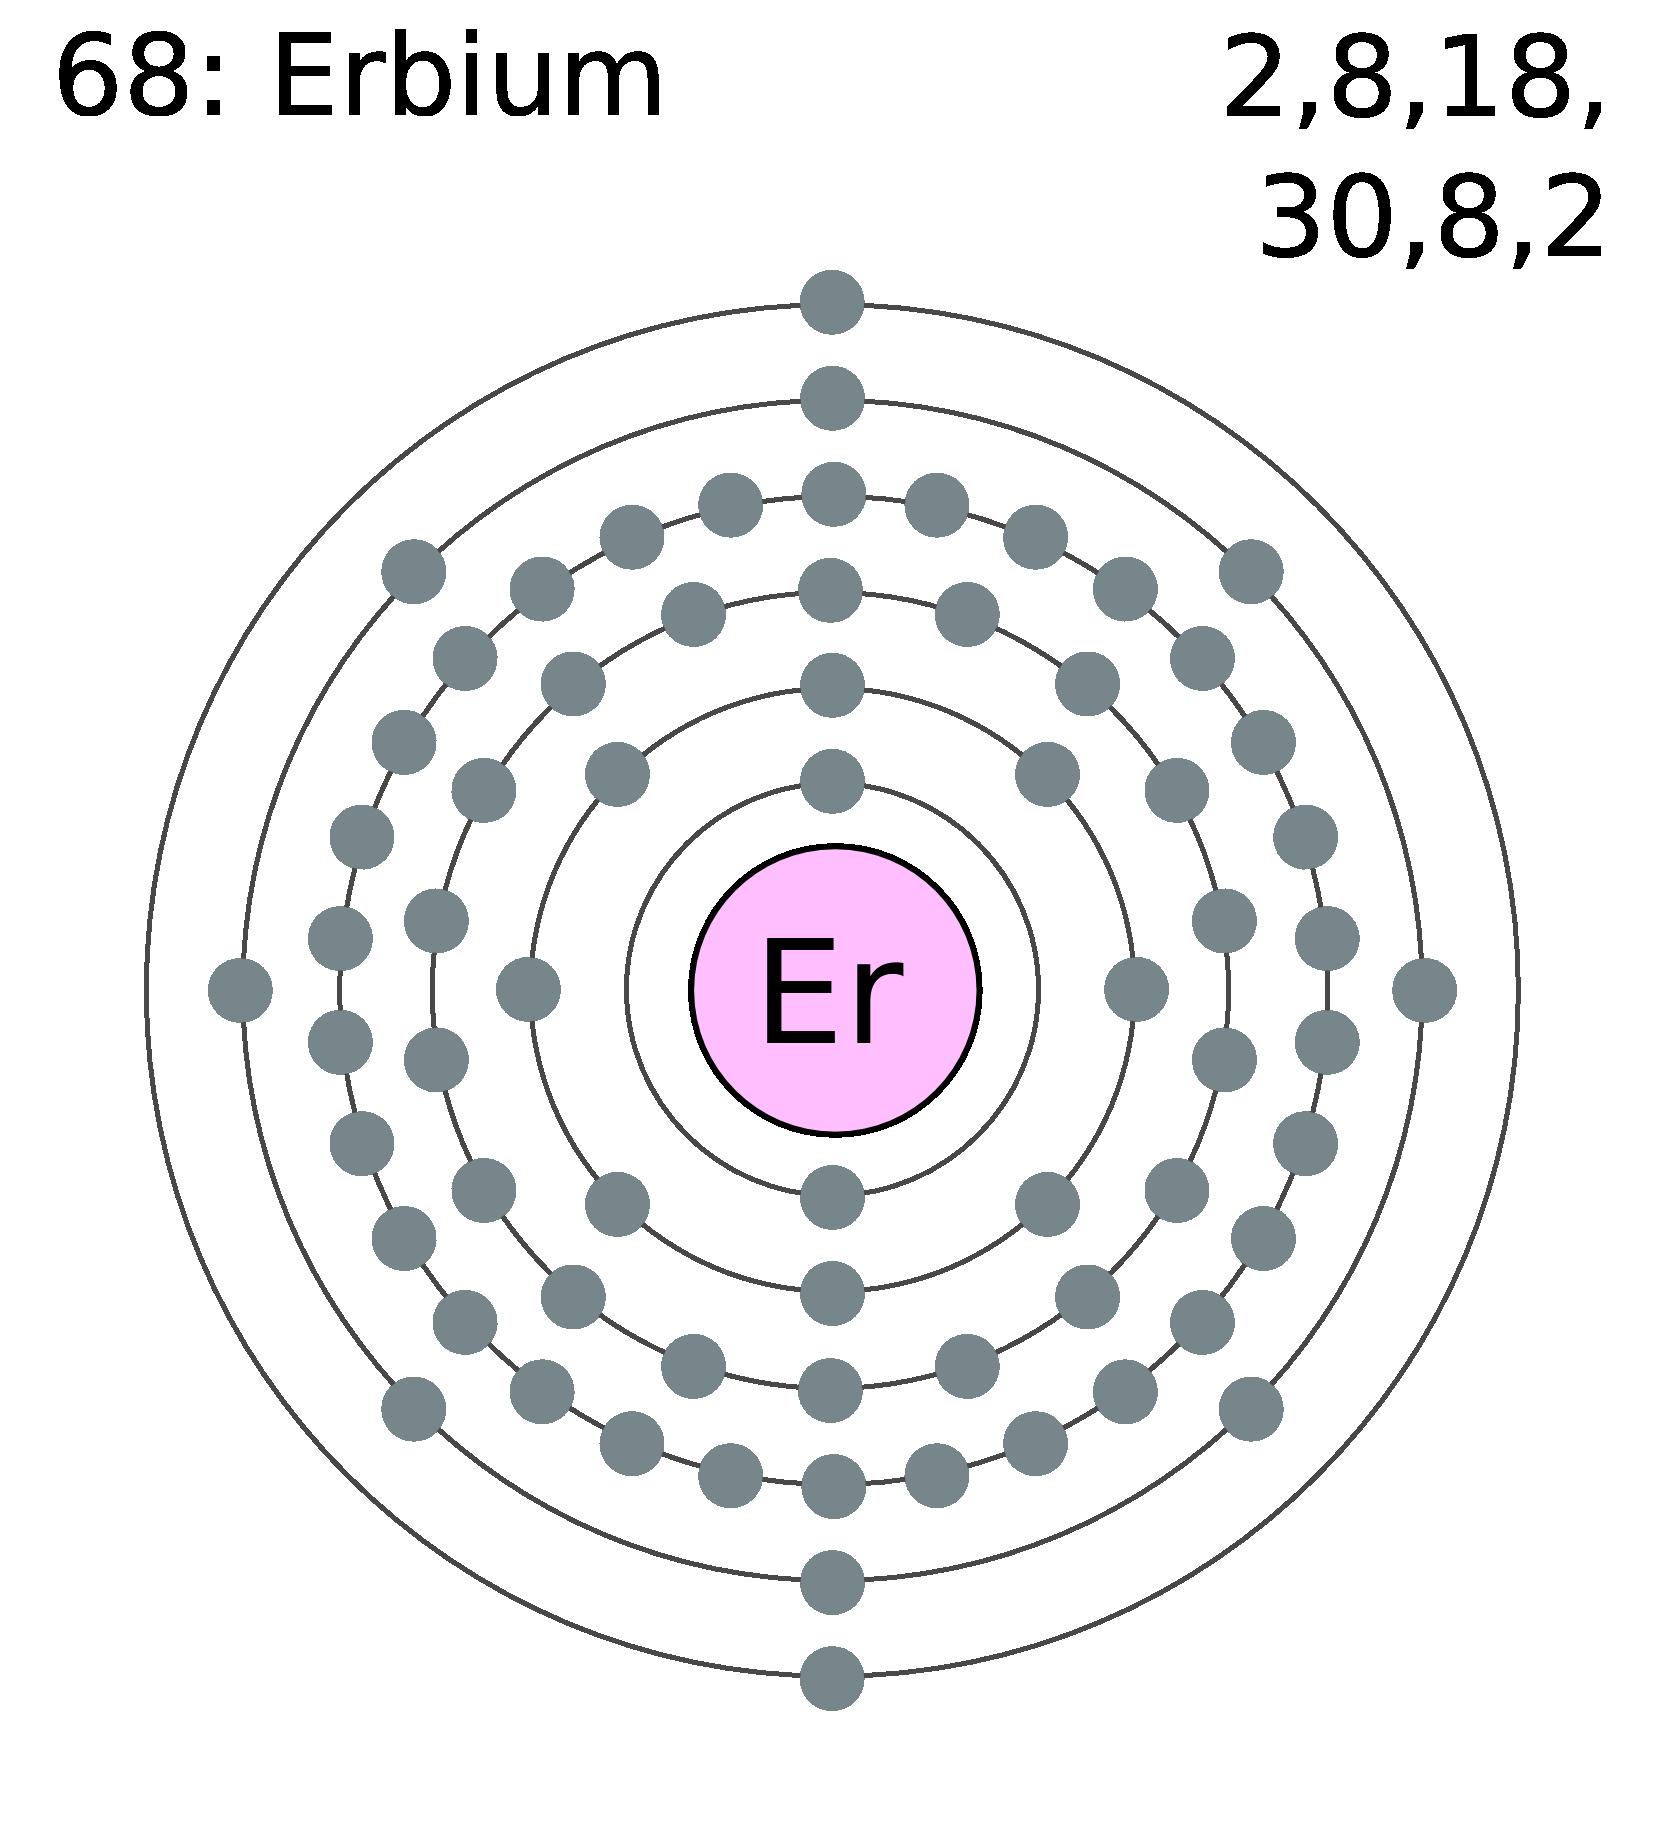 Fileelectron shell 068 erbiumg wikimedia commons fileelectron shell 068 erbiumg gamestrikefo Choice Image